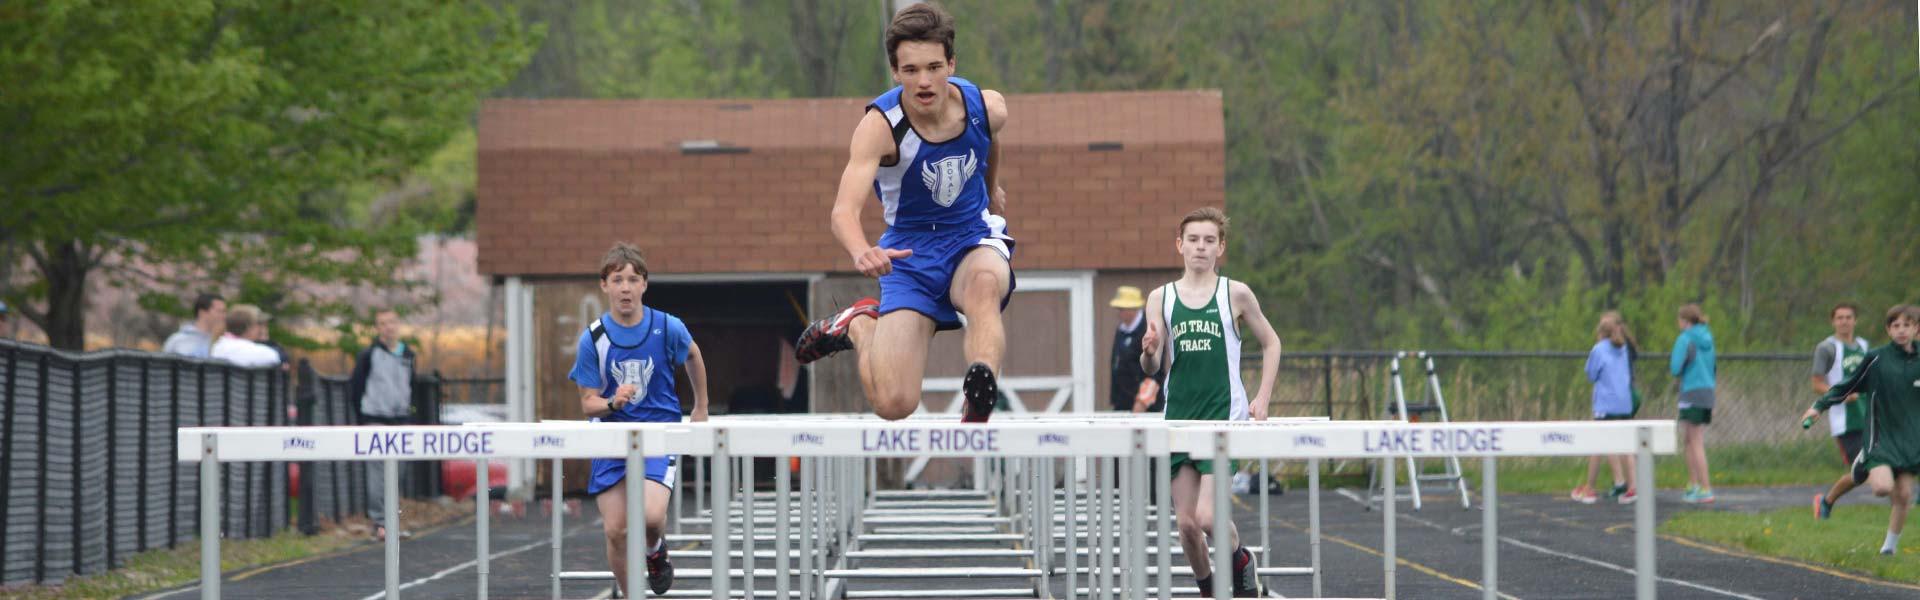 Lake Ridge Academy track students